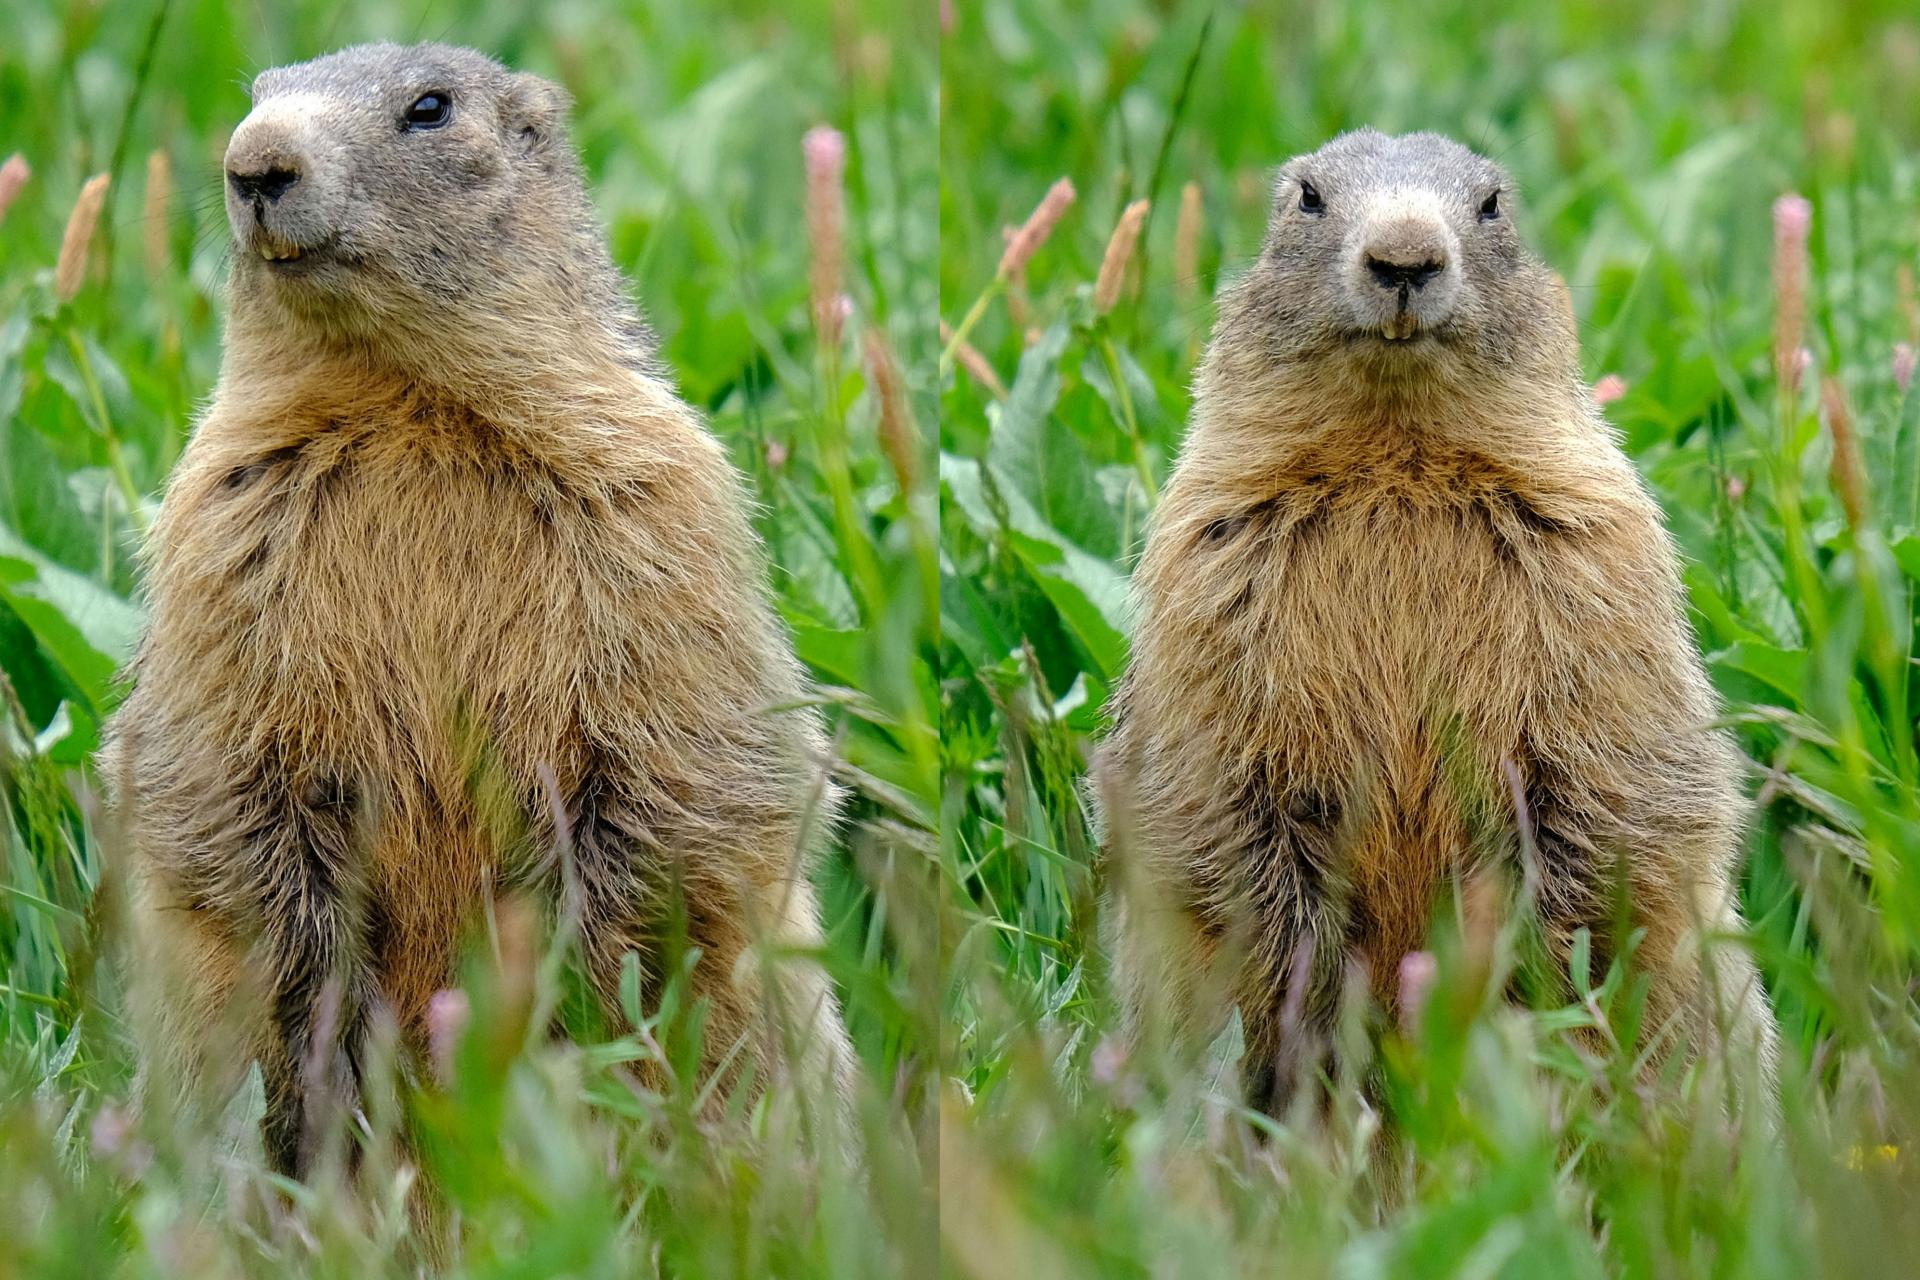 Maman marmotte pm 1